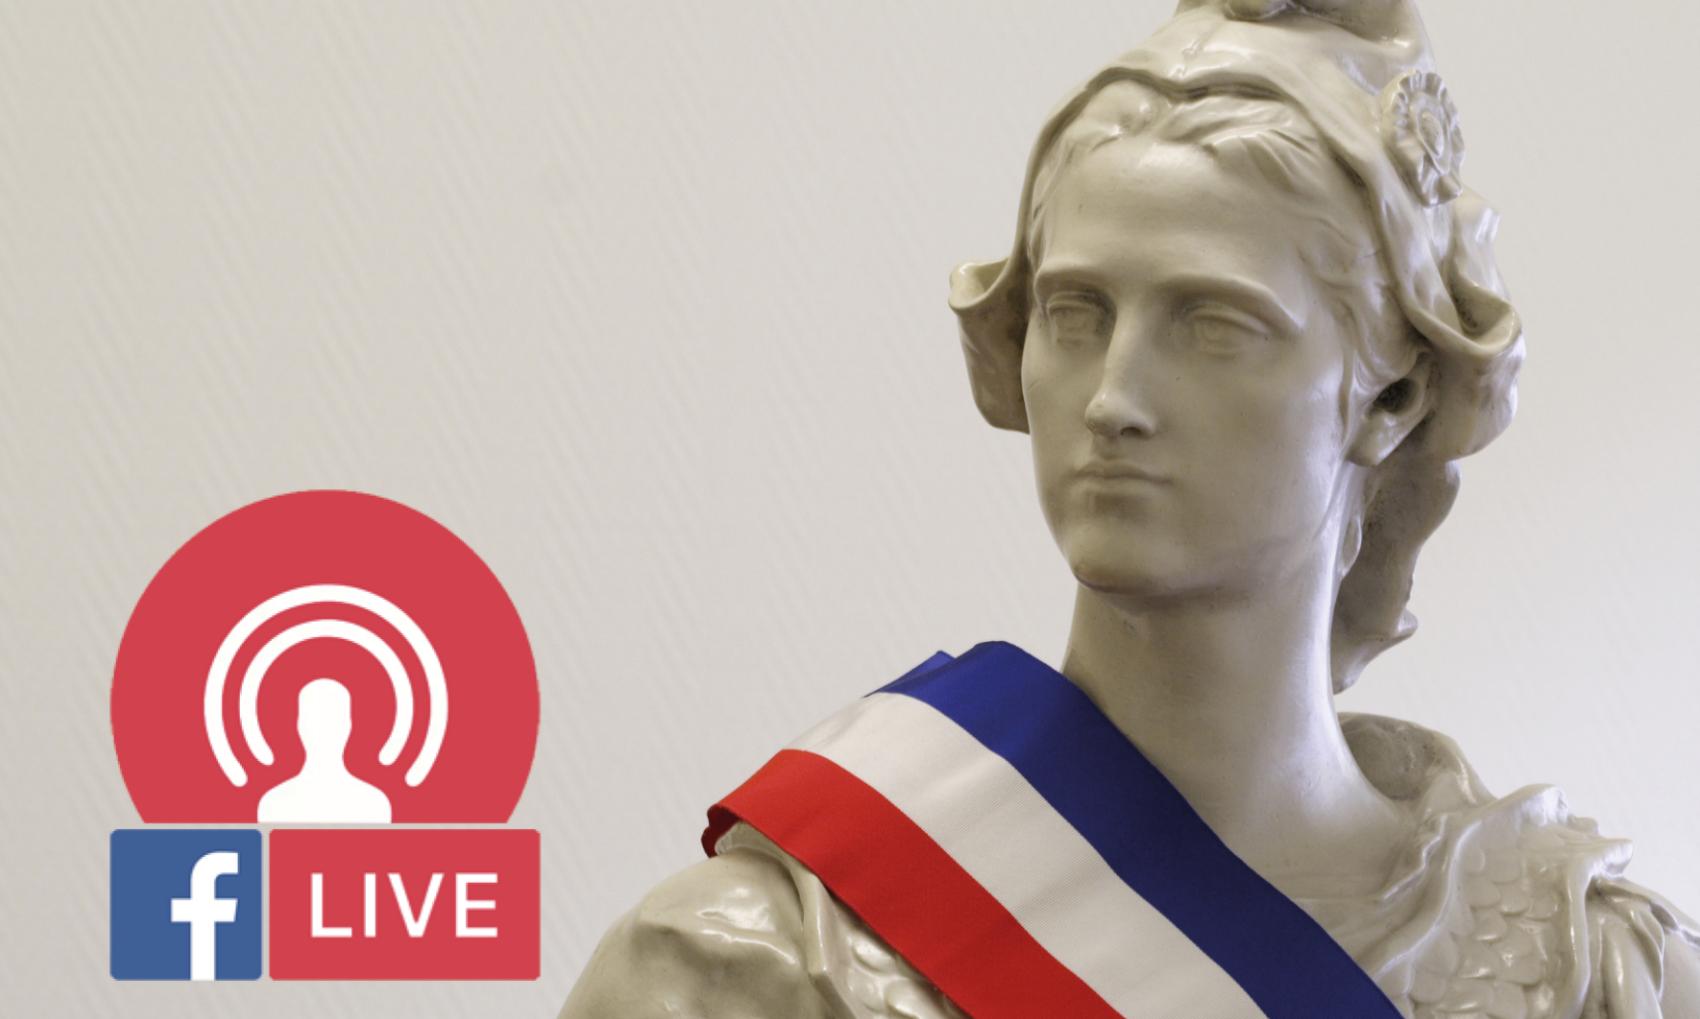 CONSEIL MUNICIPAL en direct (facebook live)